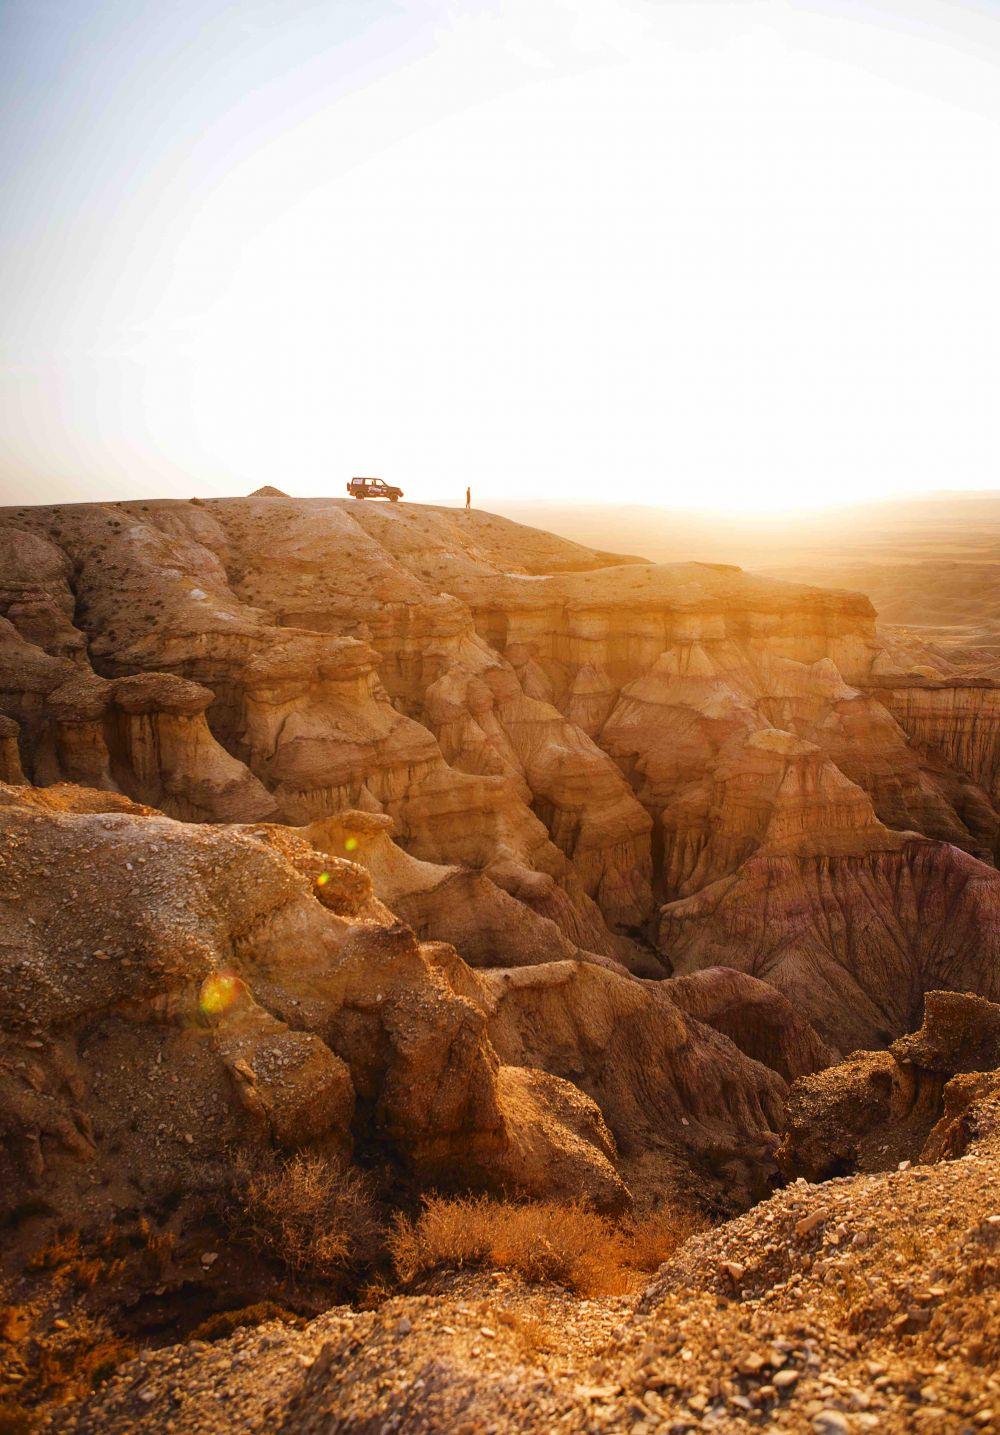 Liqui Moly Extreme Mongolia 4x4 roadtrip travel journey to white stupa tsaagan suvarga in Gobi desert